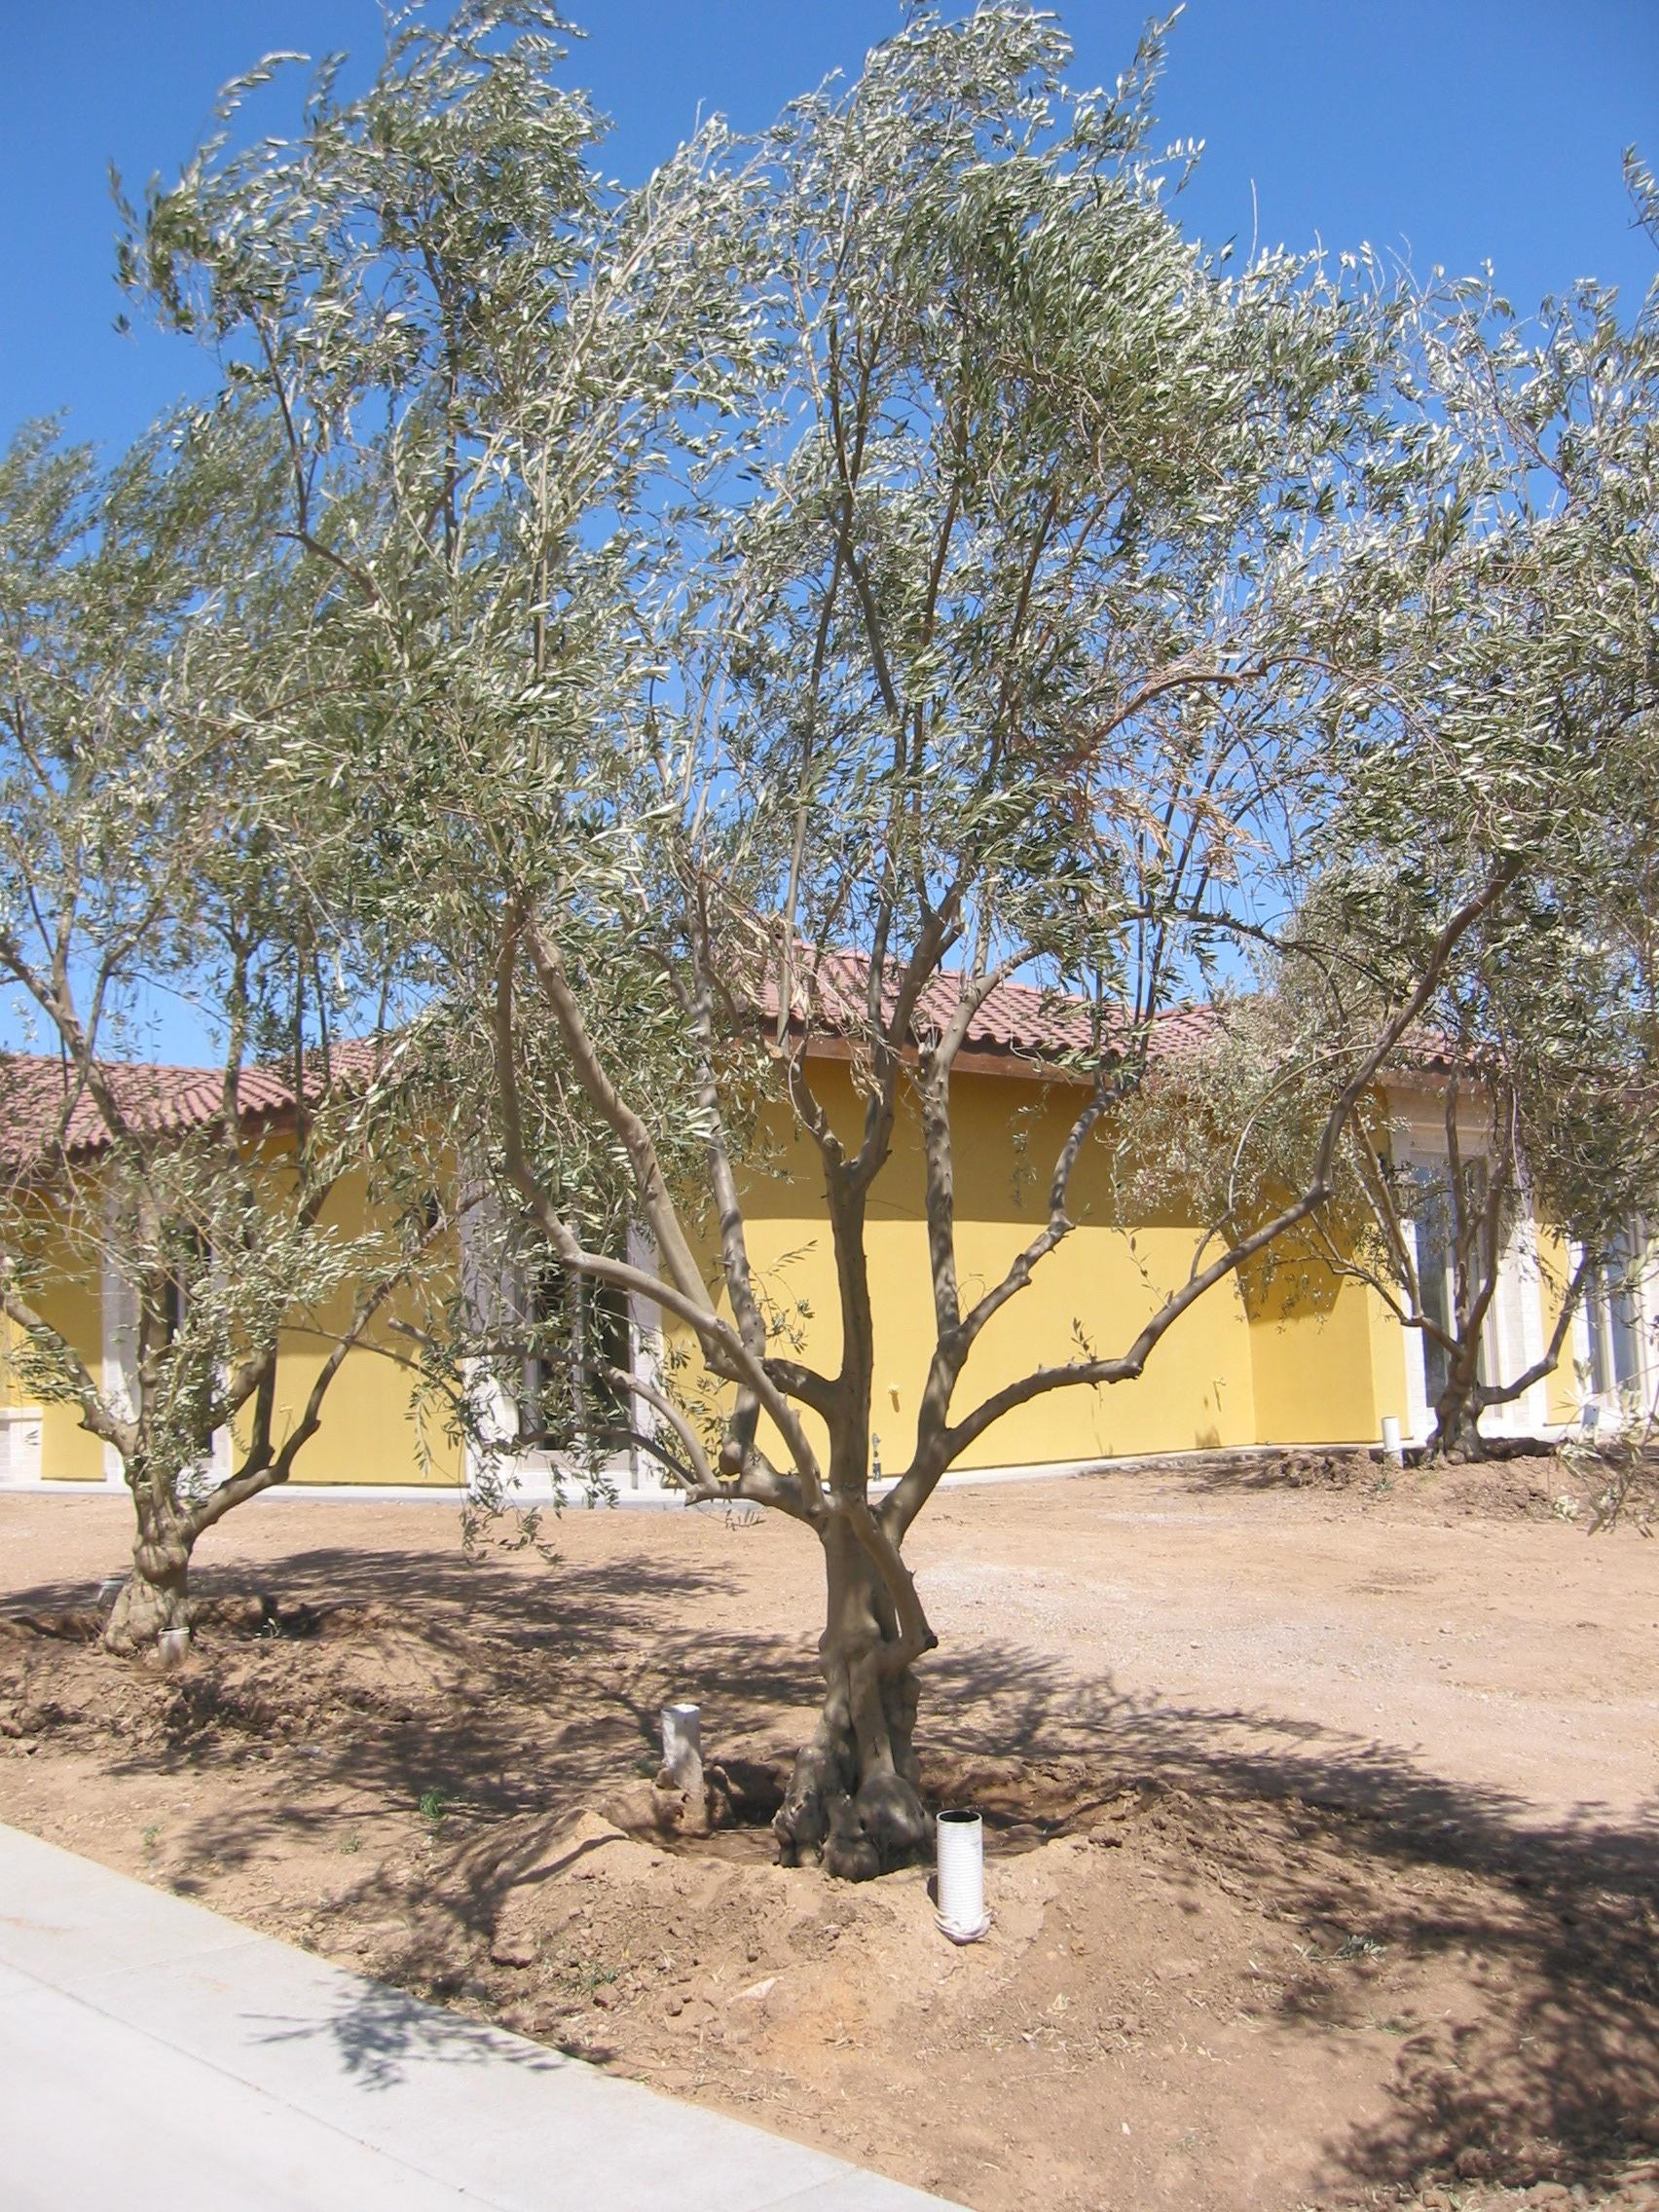 Big Olive Trees - Small